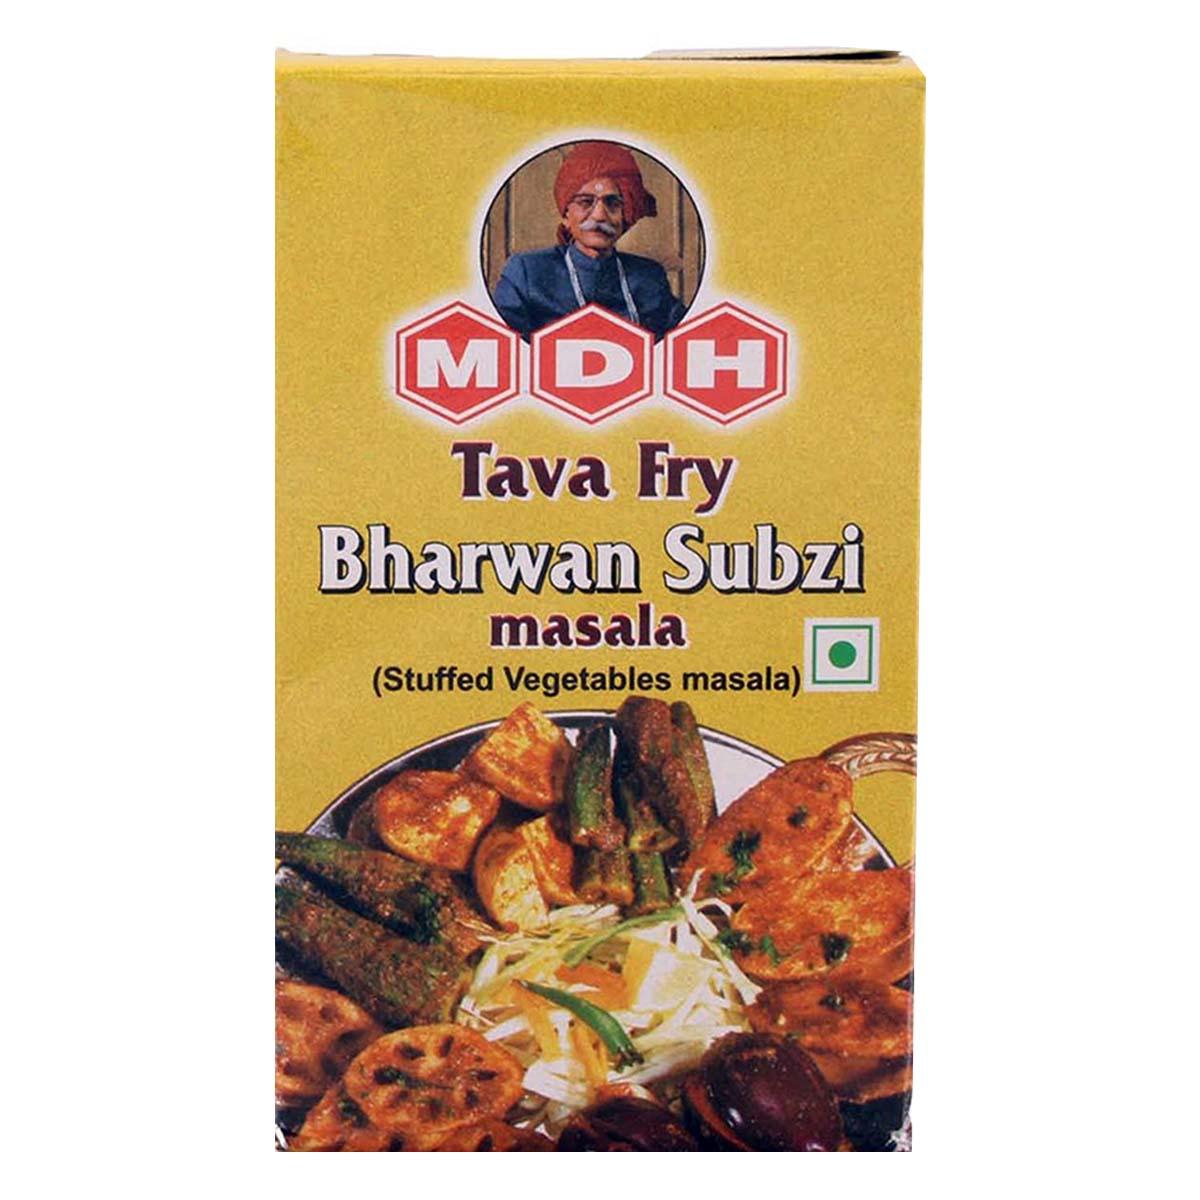 Buy MDH Tava Fry Bharwan Subzi Masala (Stuffed Vegetables Masala) - 100 gm